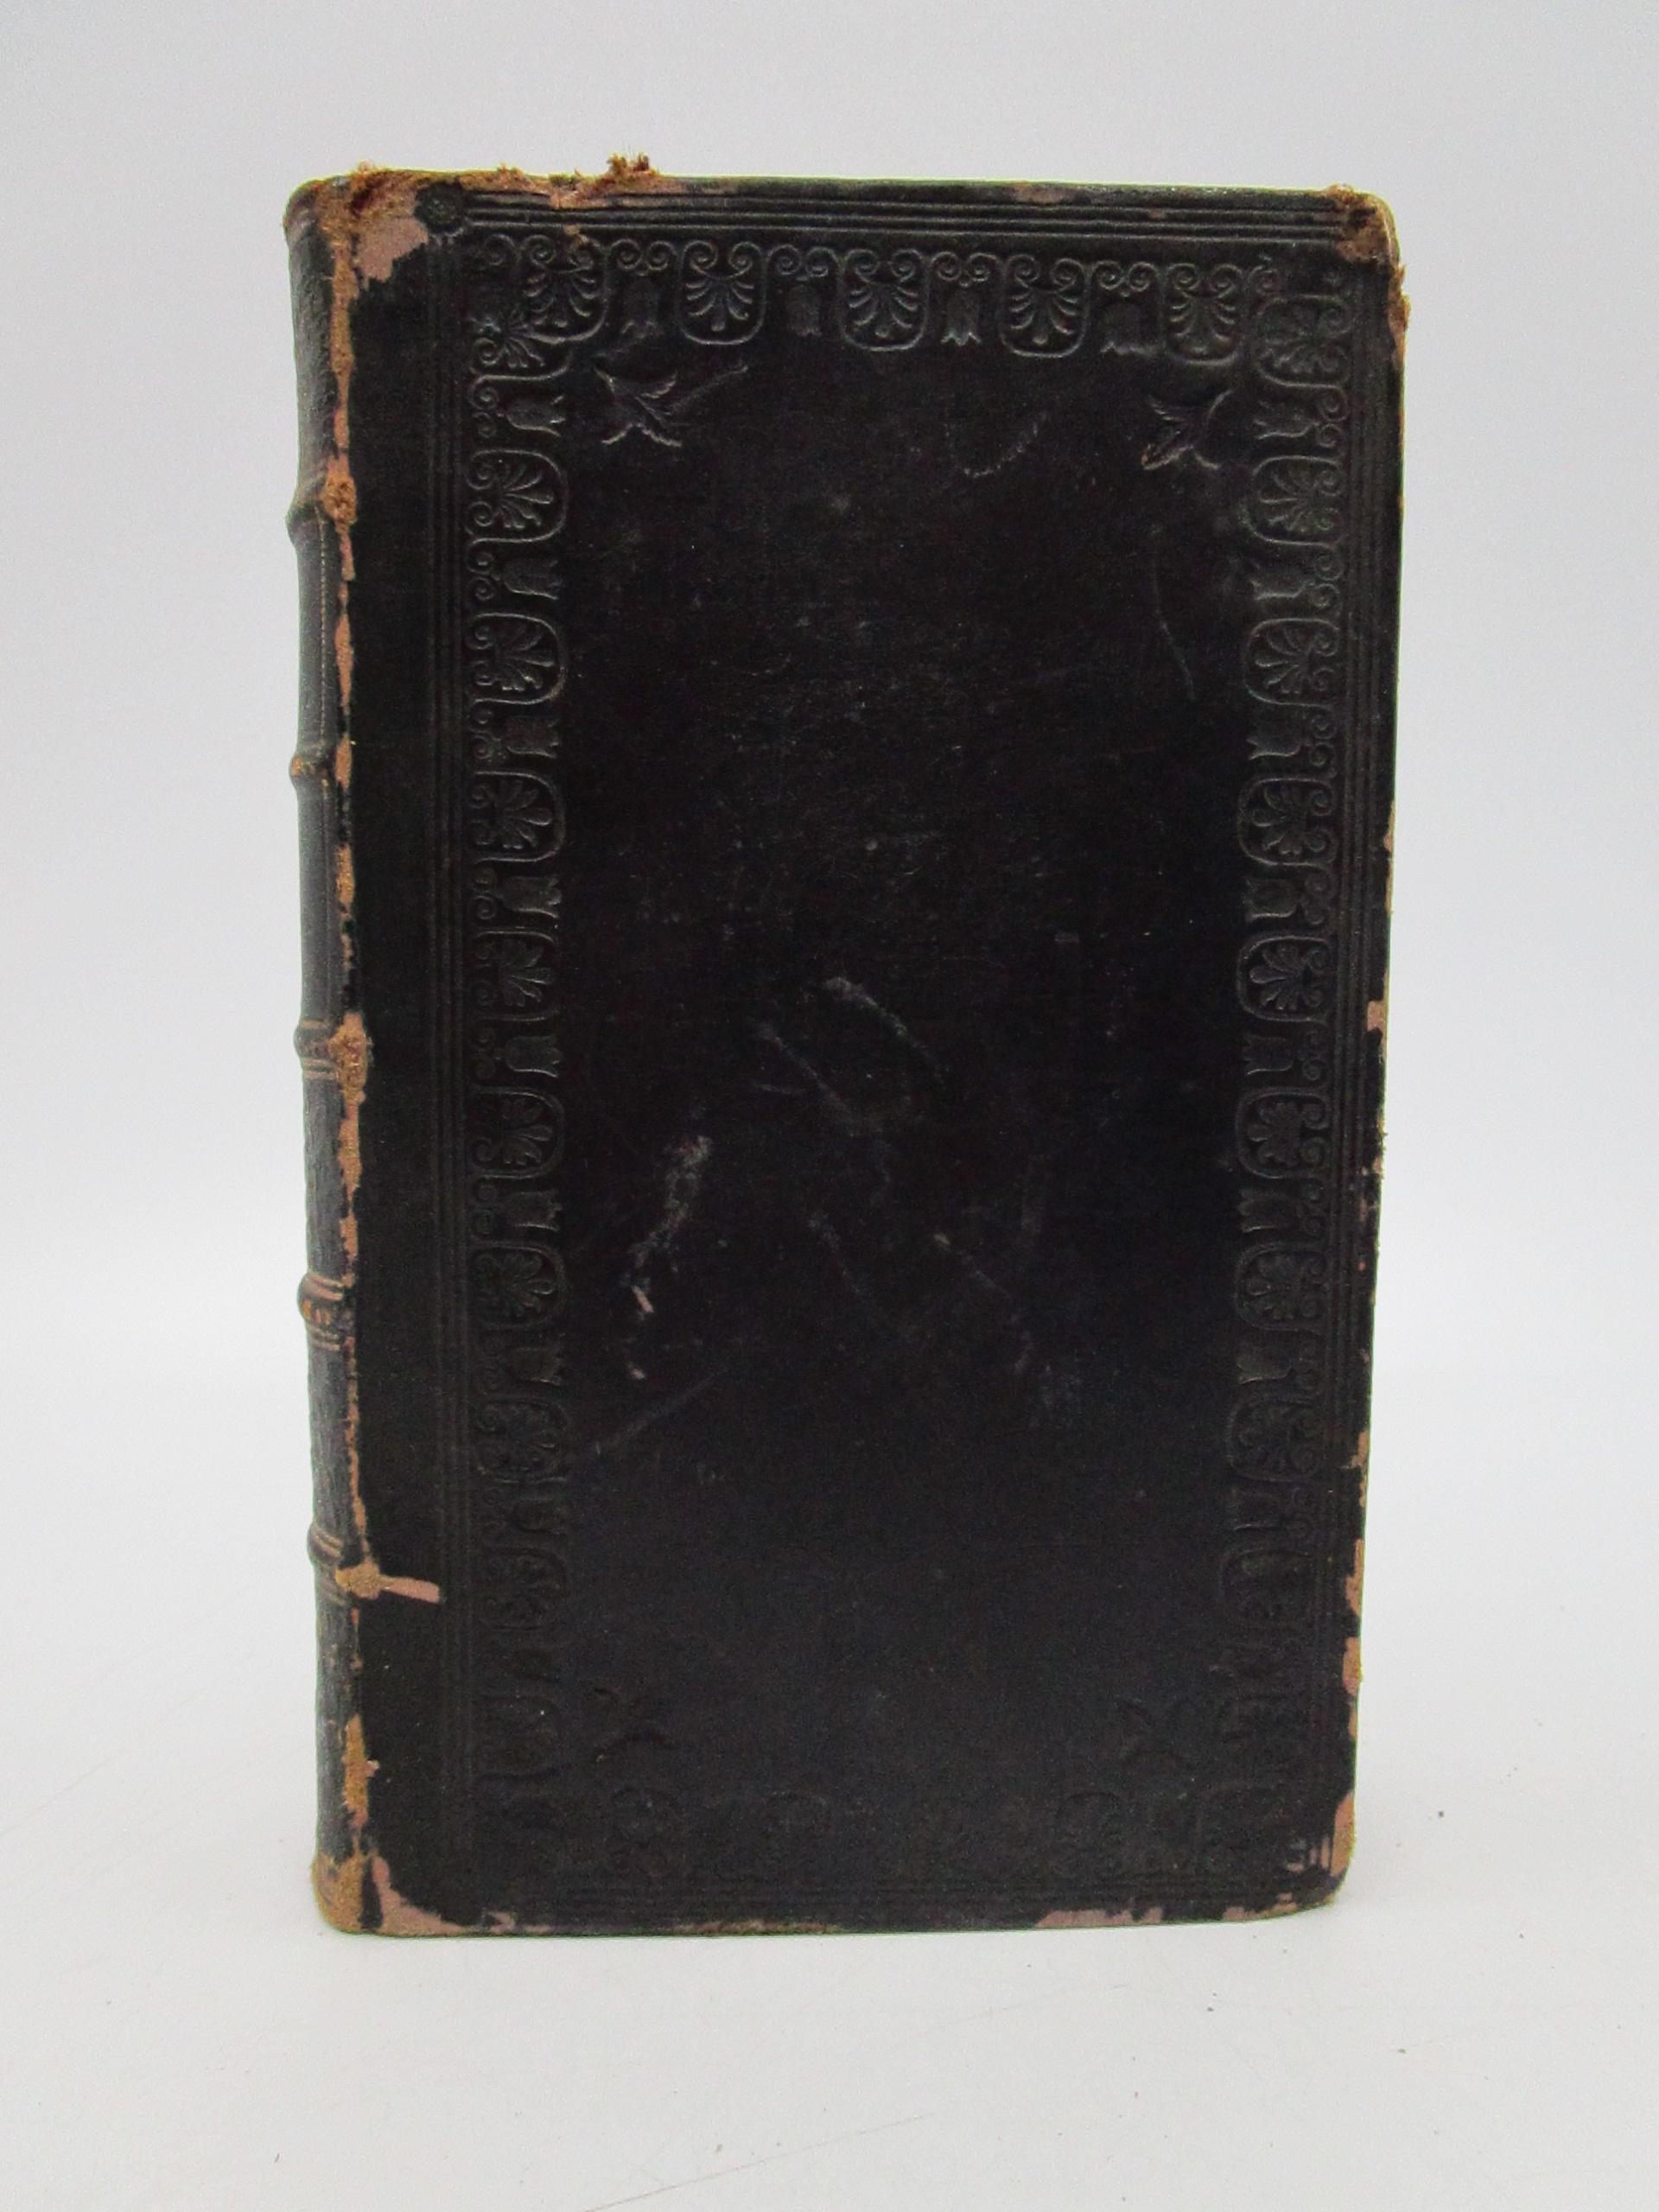 Image for Exhortations et Instructions Chretiennes. Tome Premier